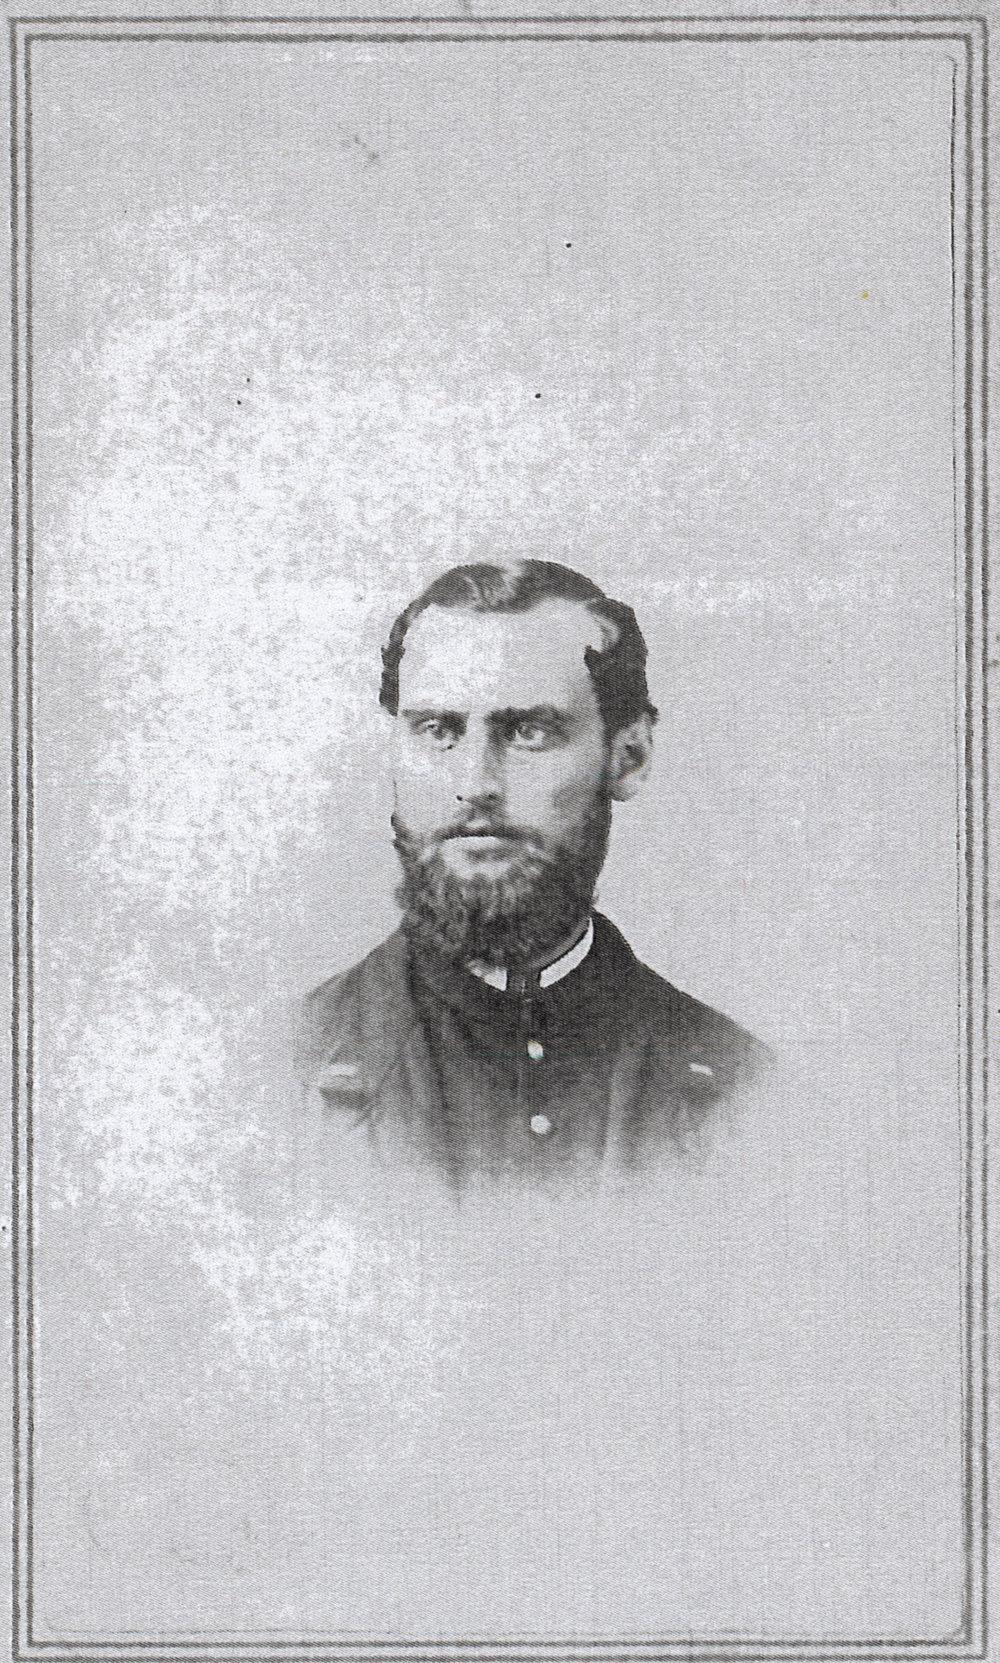 Joshua R. Benson of Company G